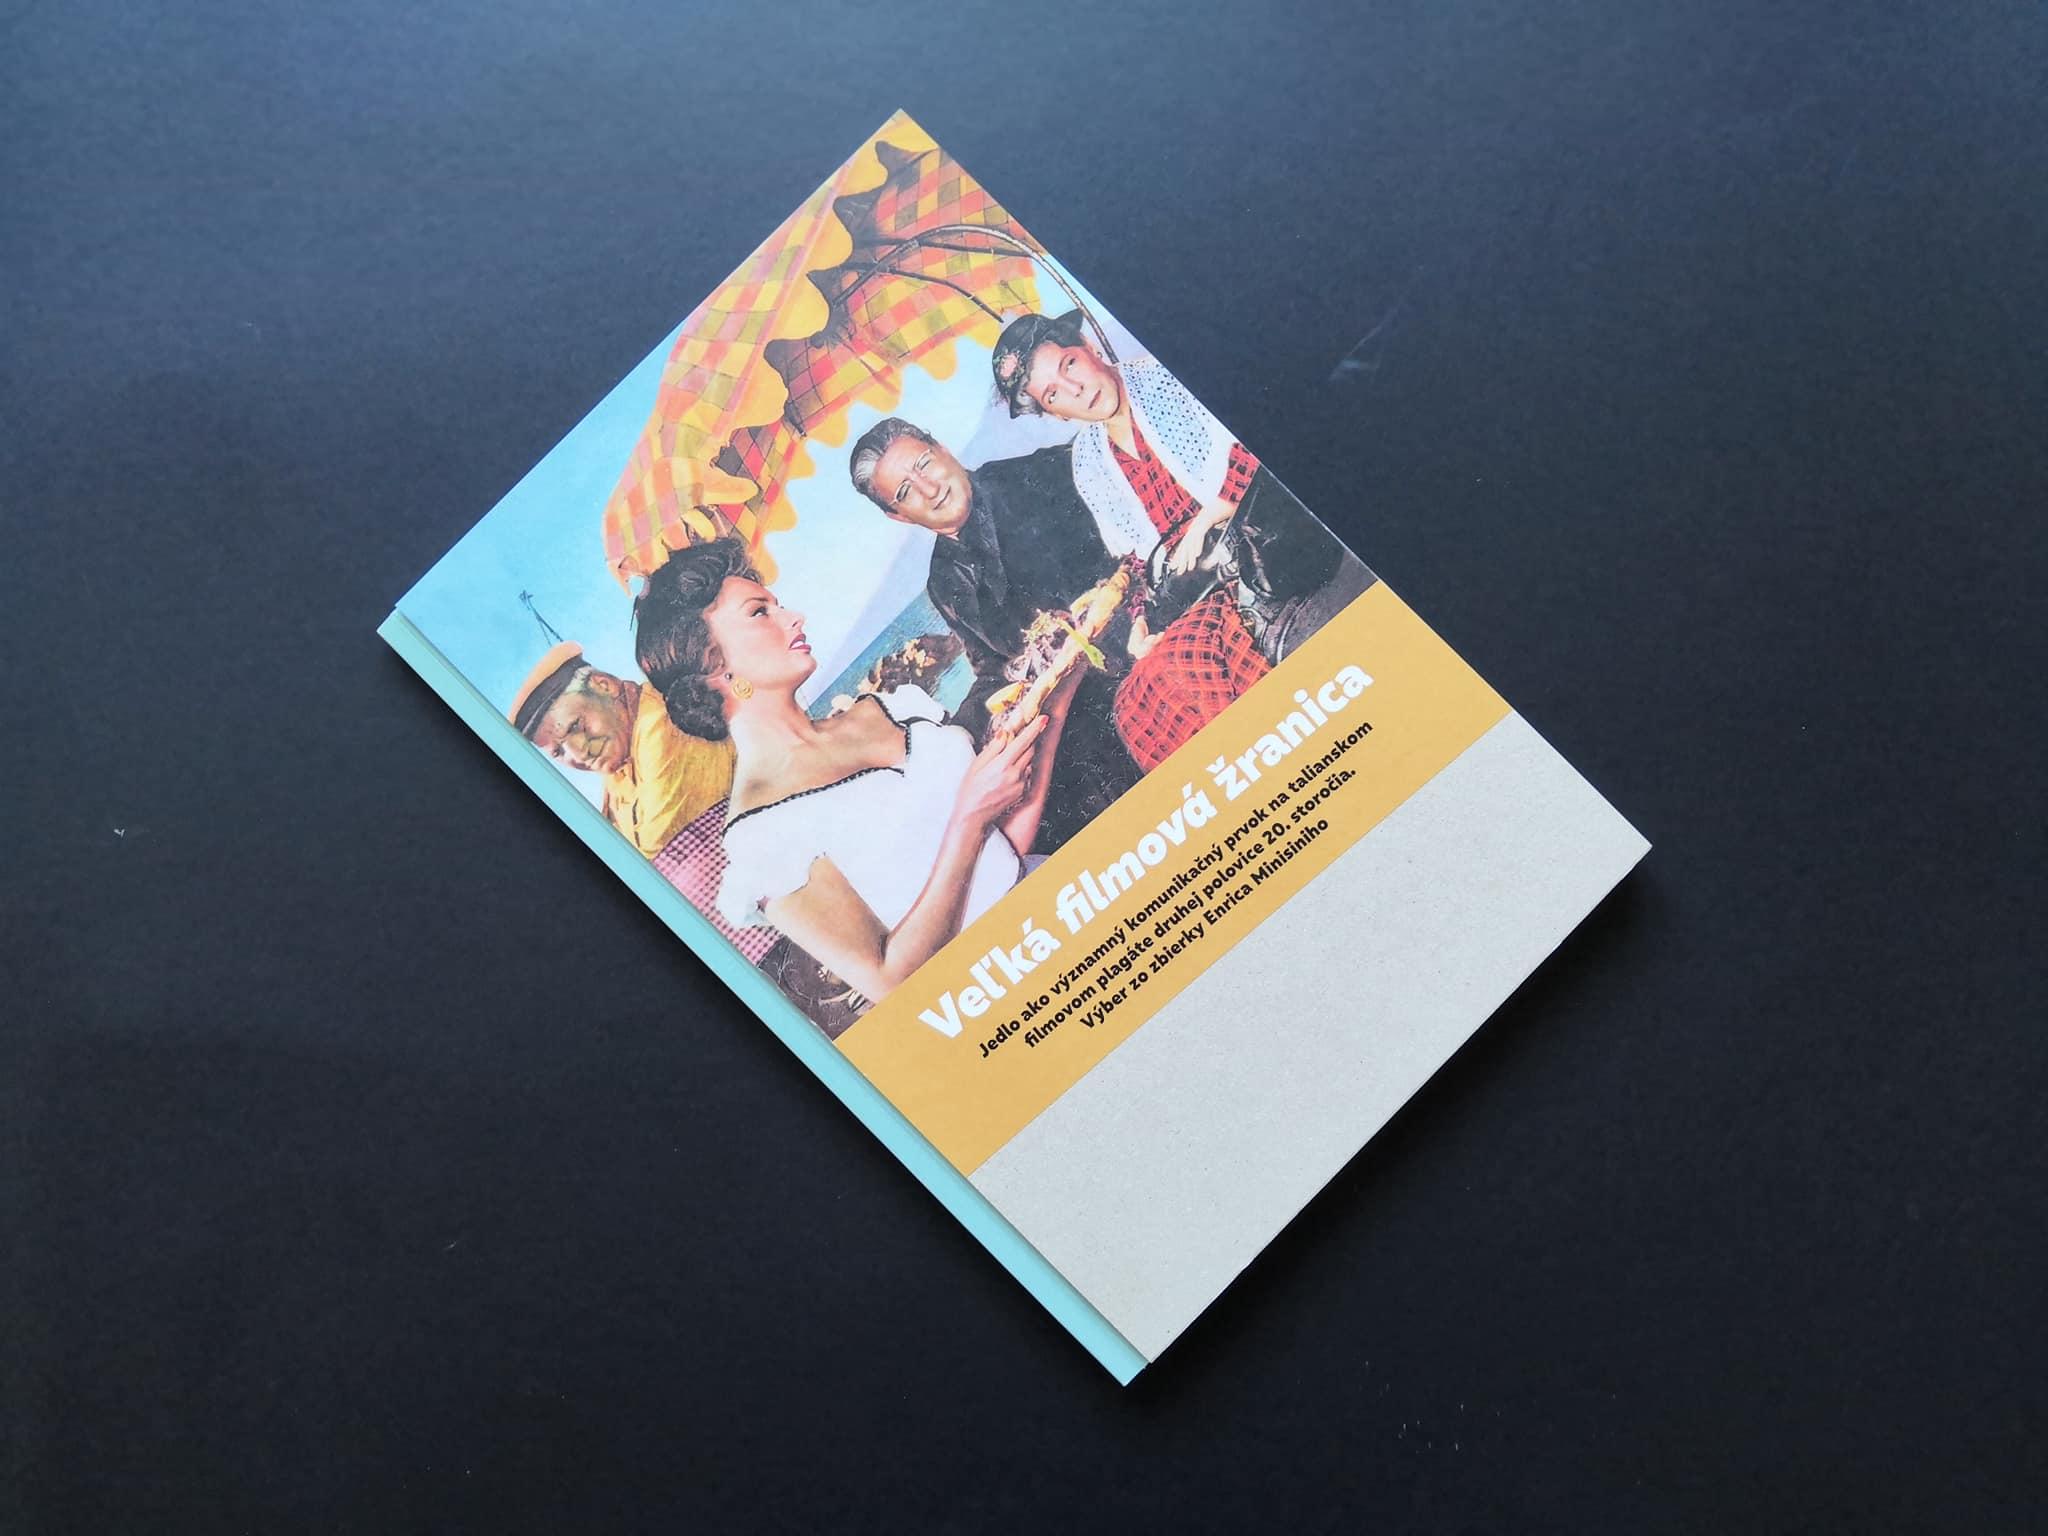 Exhibition Veľká (Filmová) žranica catalogue, 2018